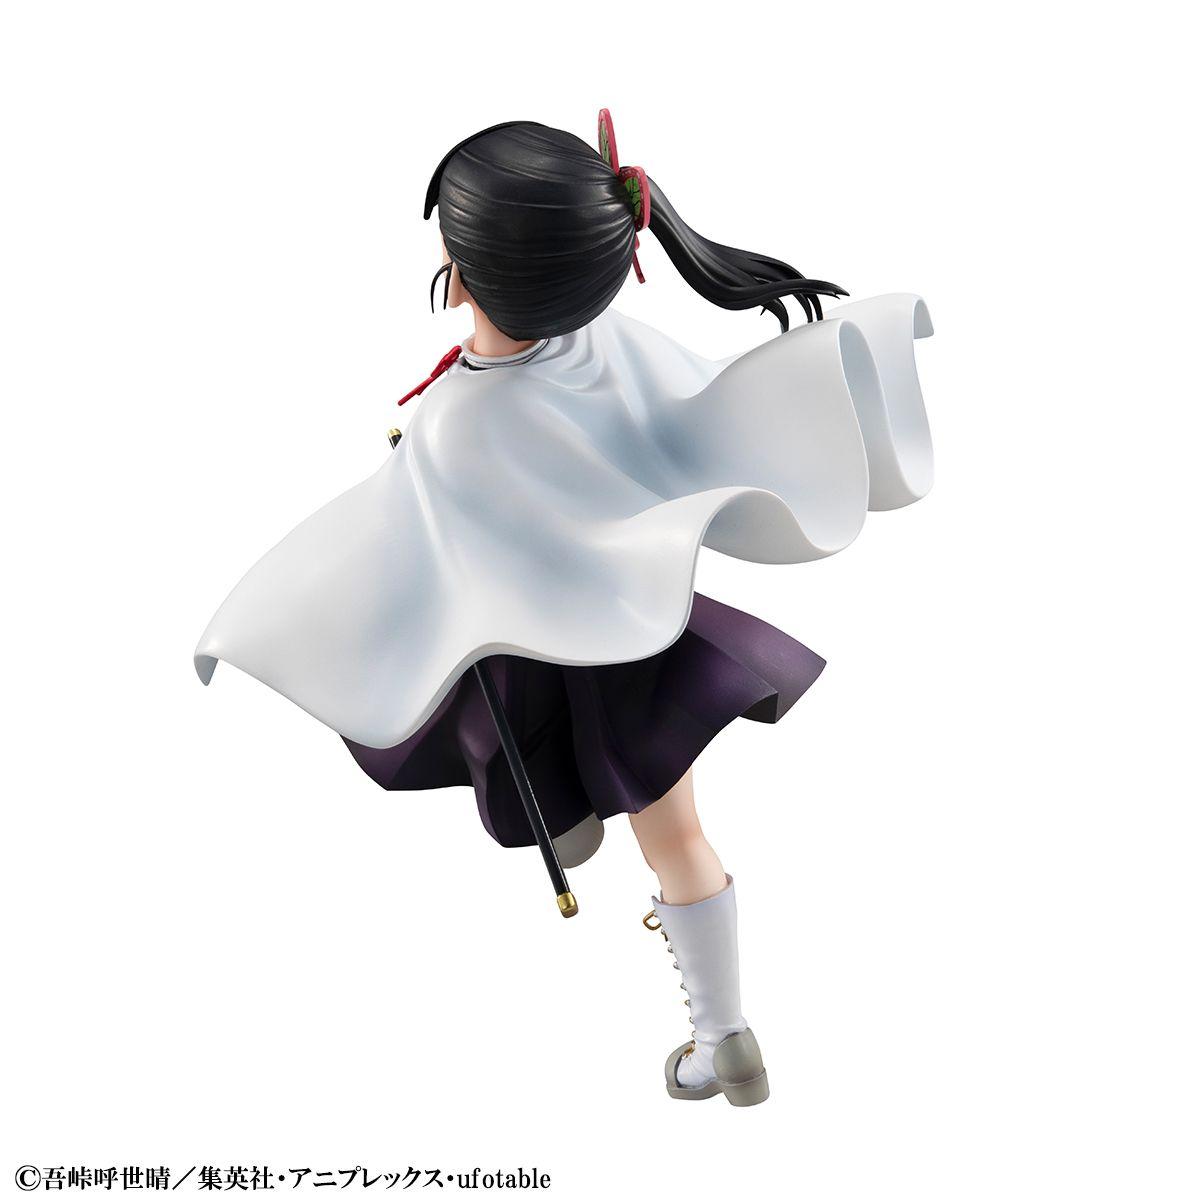 Kanao_4 - Figura semanal - (3-16-5-2021) - Hanami Dango